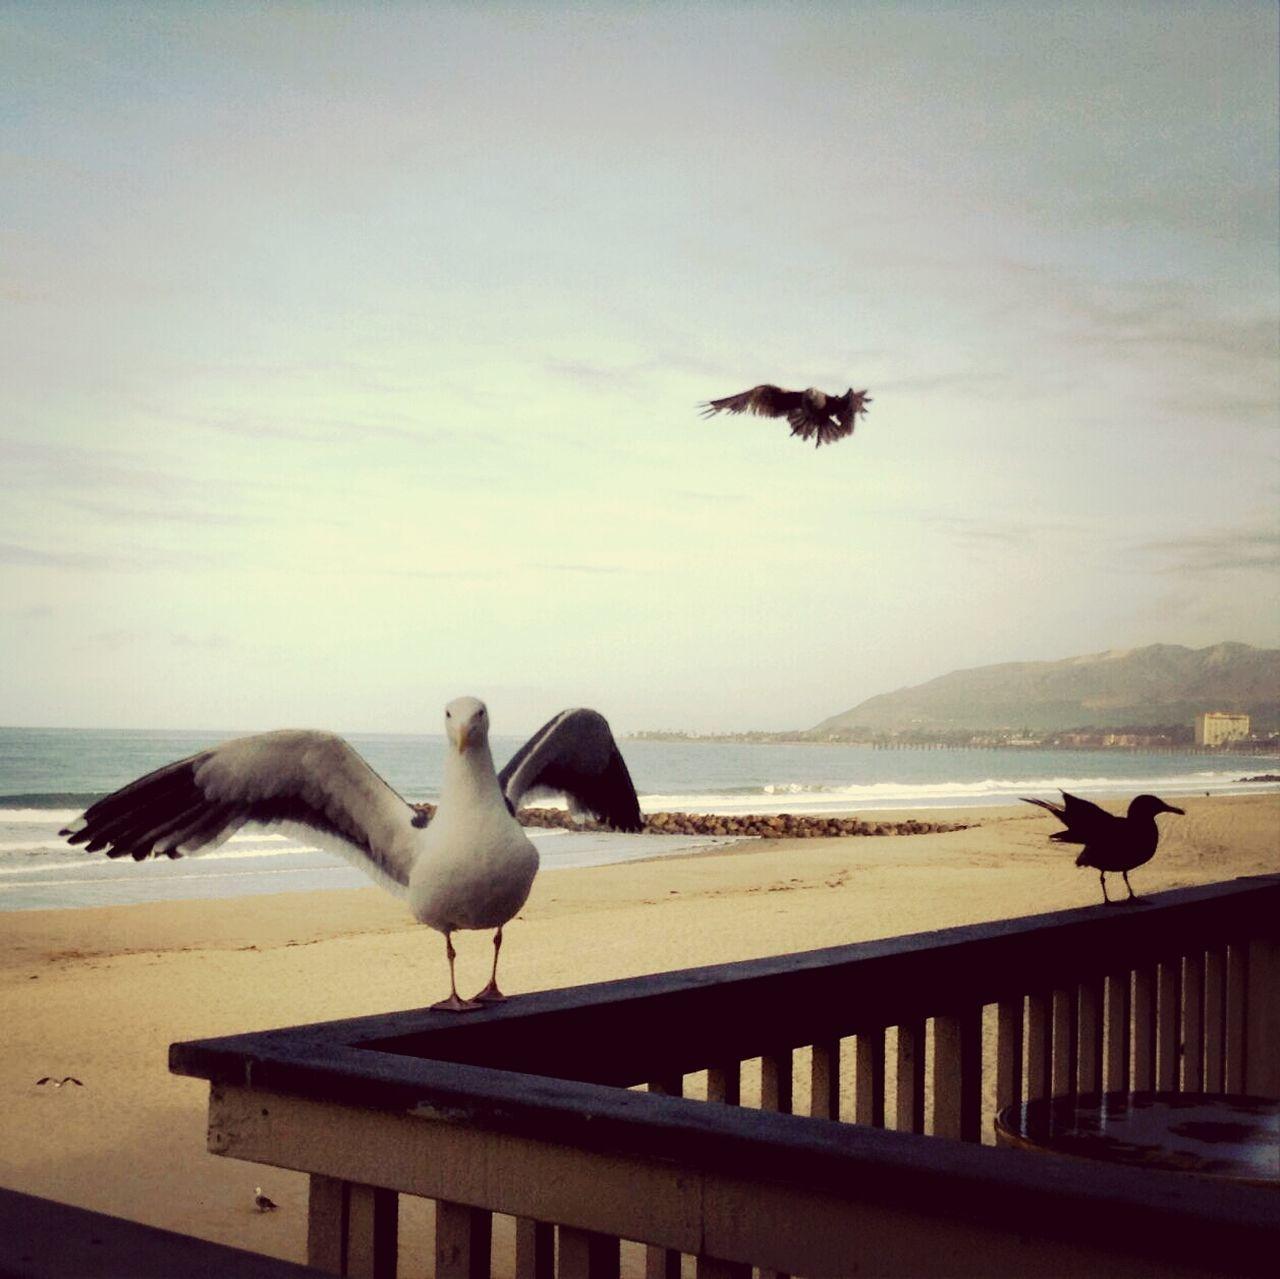 Country N Seaside Bird Beach Three my bffs The Moment - 2015 EyeEm Awards The Traveler - 2015 EyeEm Awards Life Is A Beach Hello World